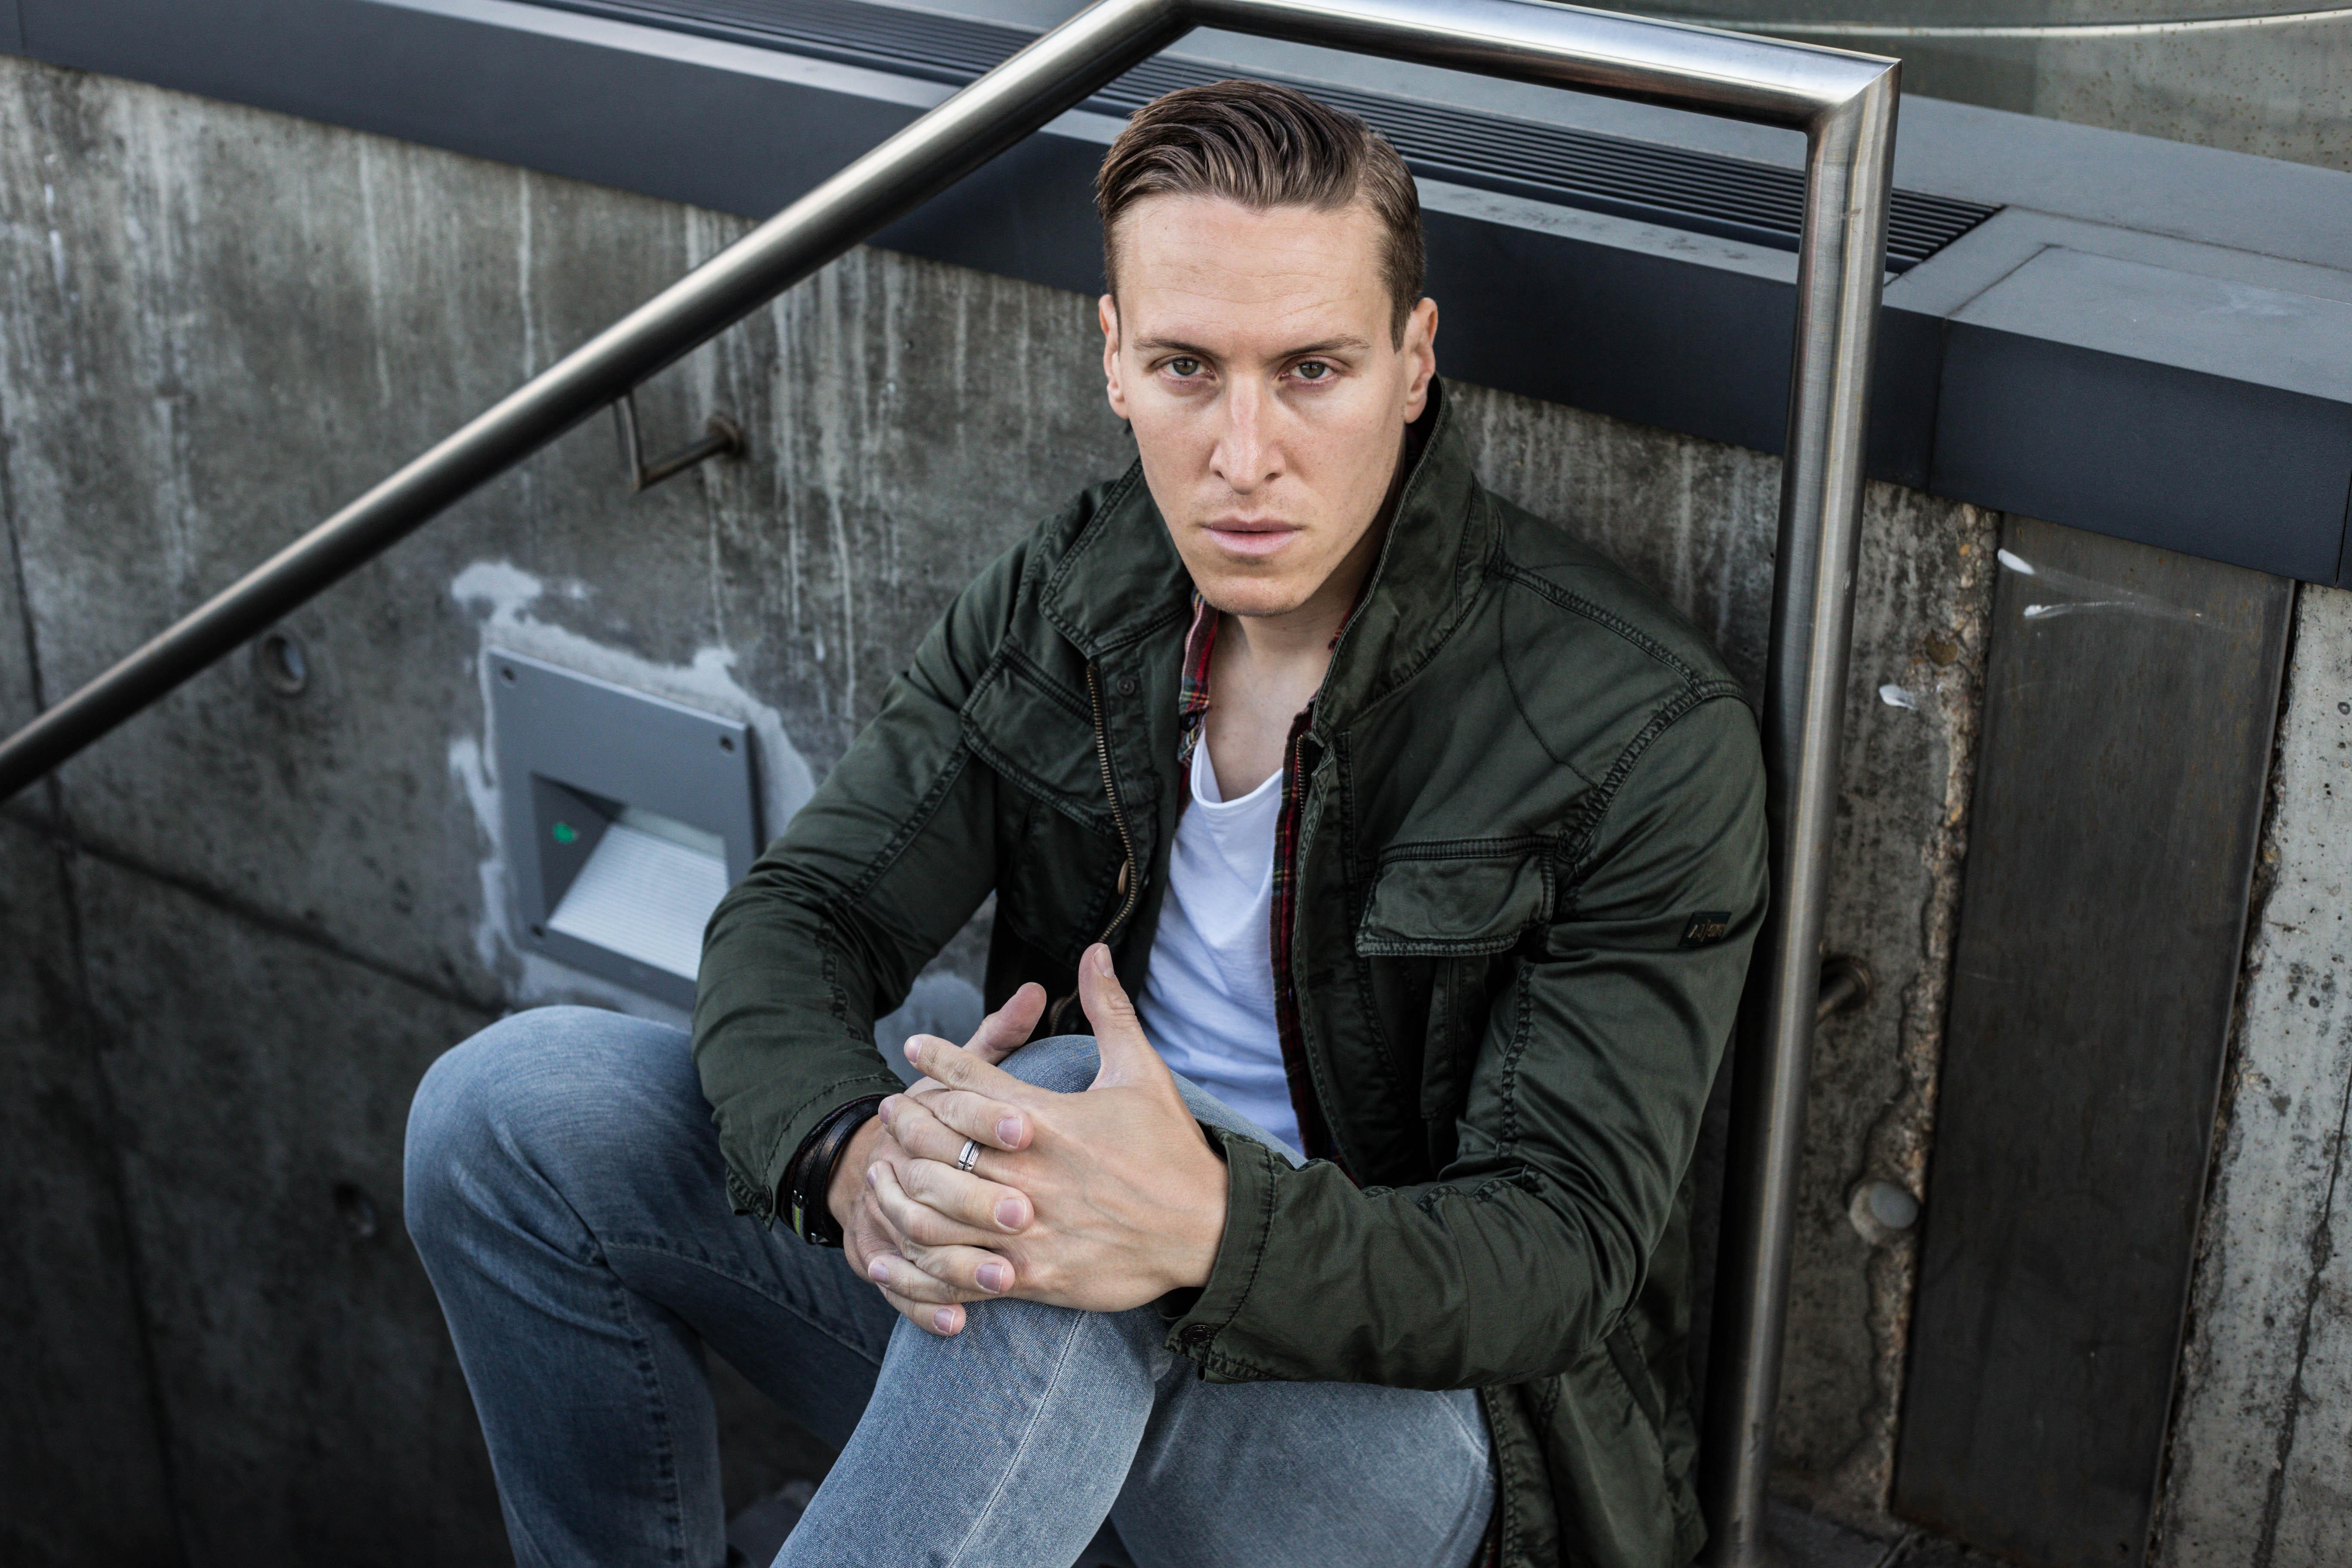 kariertes-hemd-skinny-jeans-fashionblog-menfashion-chelsea-boots-gruener-kurz-parka_7669